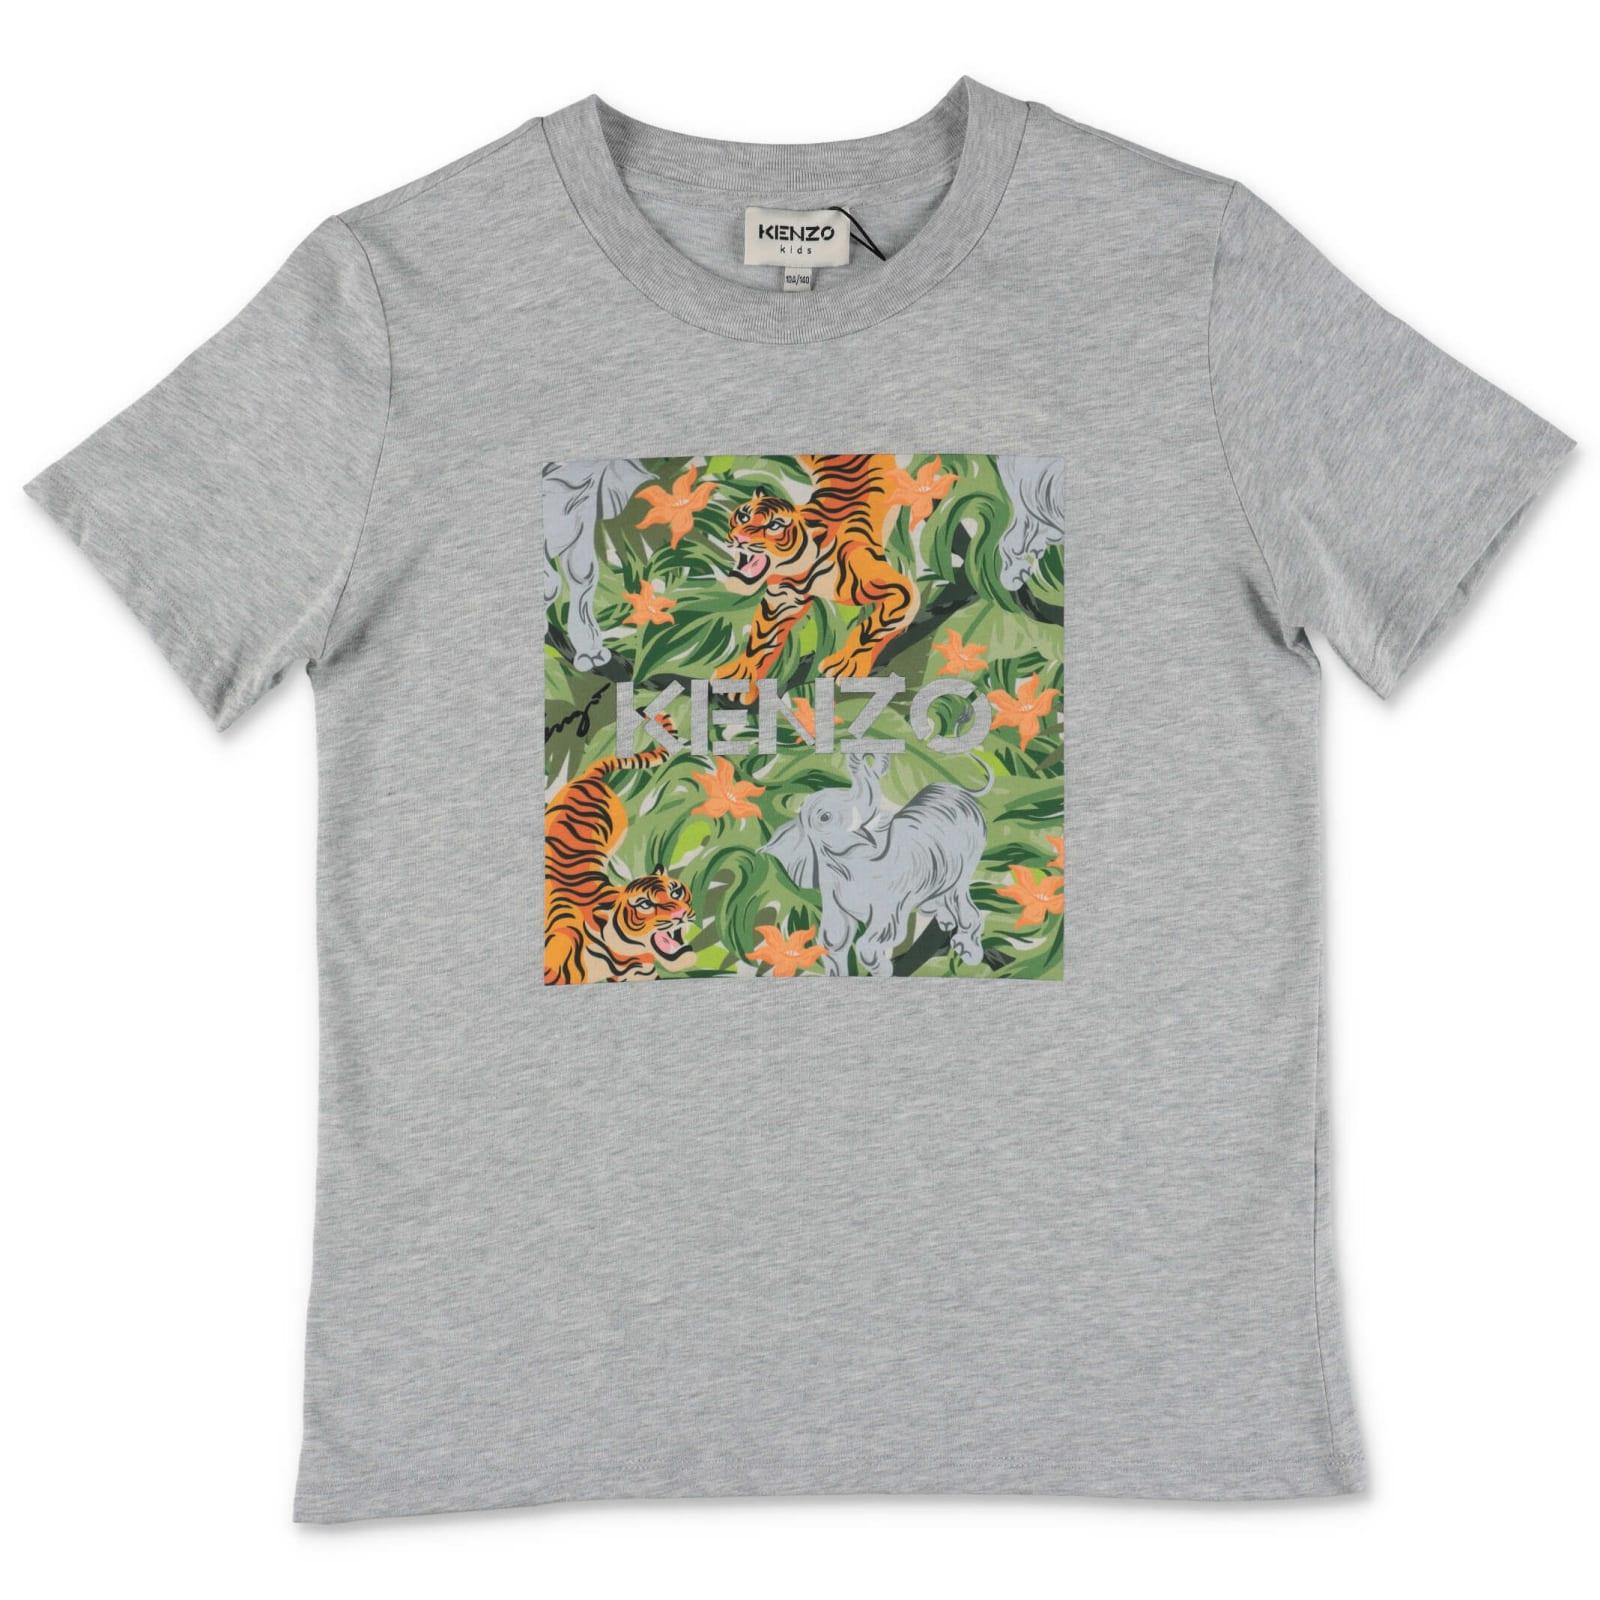 Kenzo Kids T-shirt